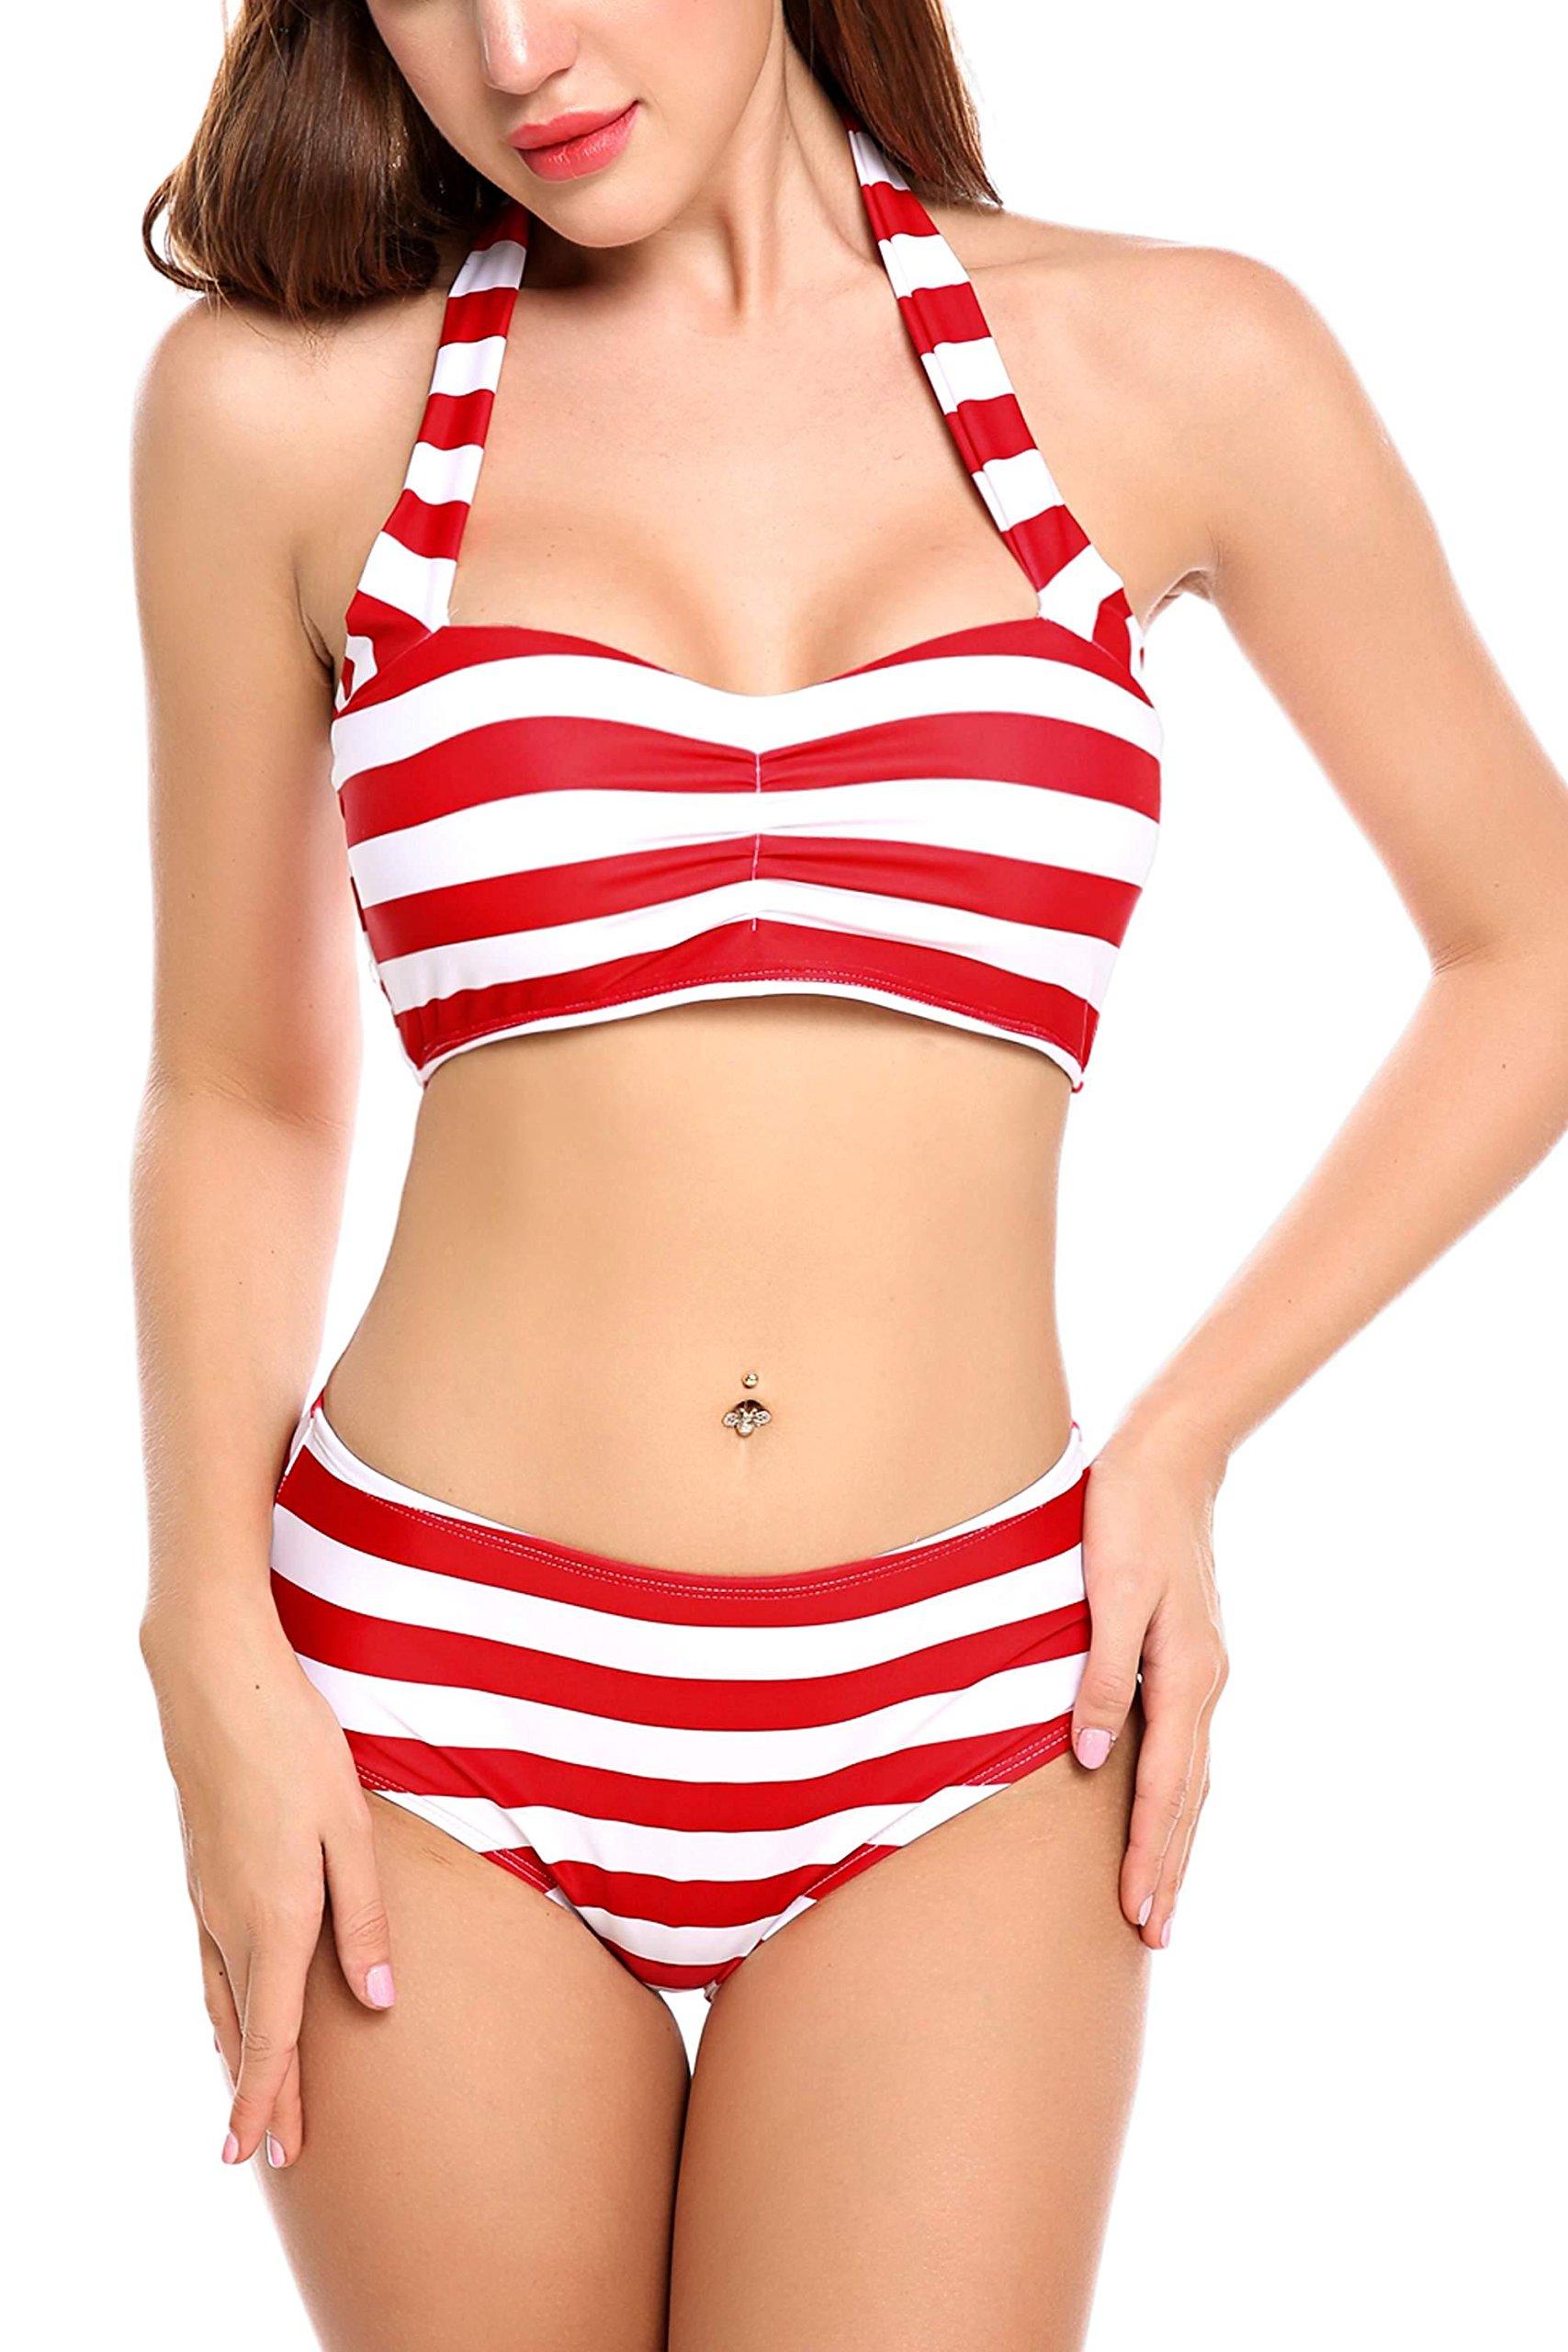 ADOME Women High Waisted Swimwear Push up Bikini Set Halter Underwired Swimsuits, Style 1-red, Medium